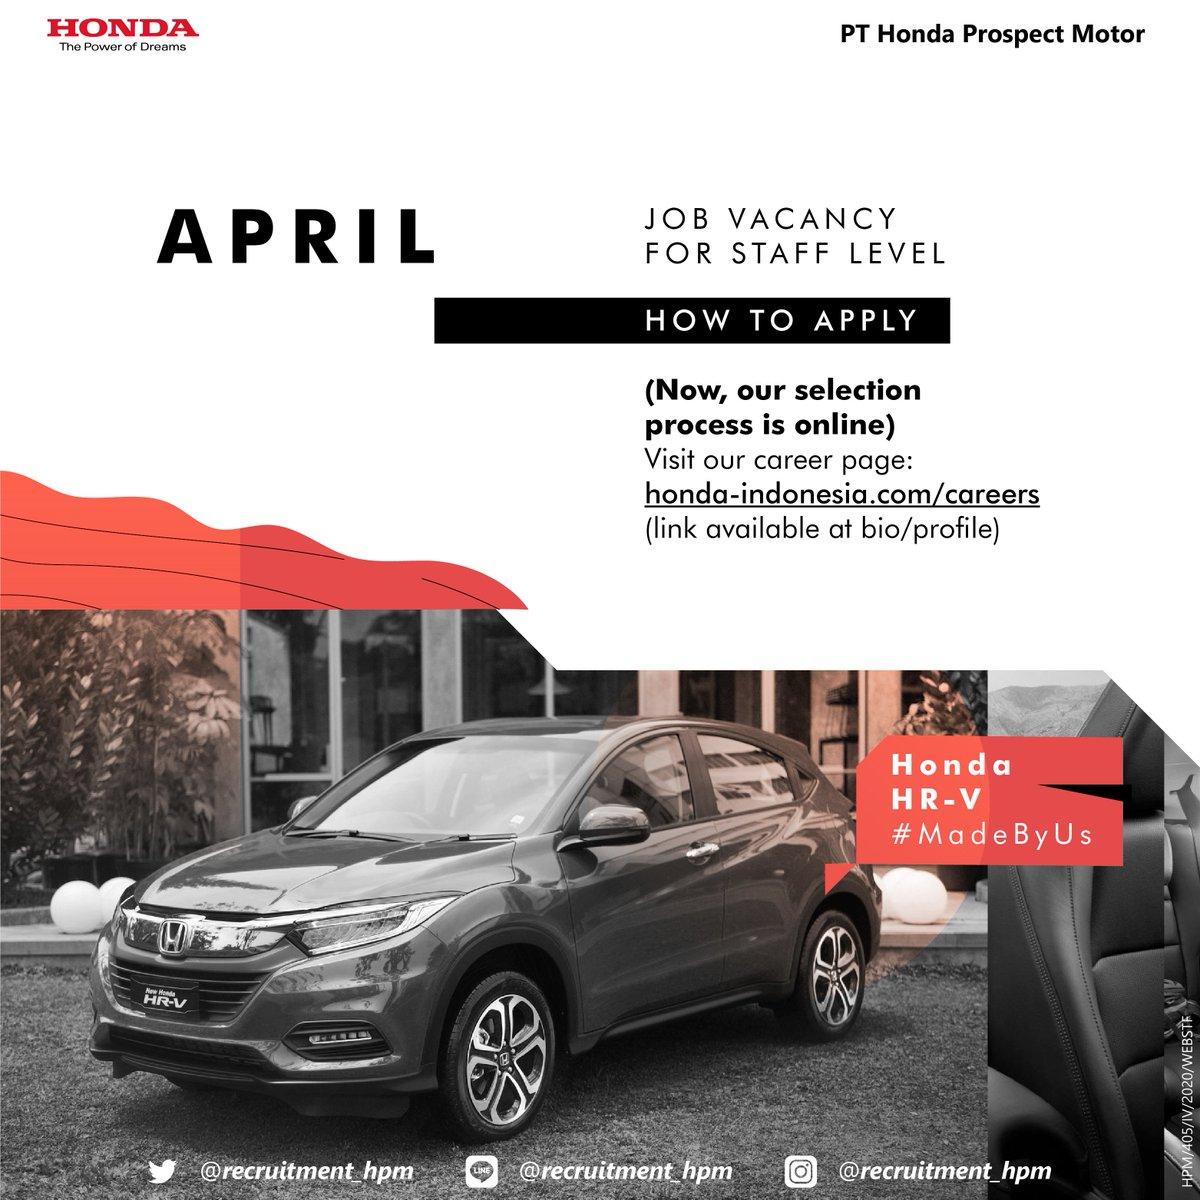 Kekurangan Pt Honda Murah Berkualitas